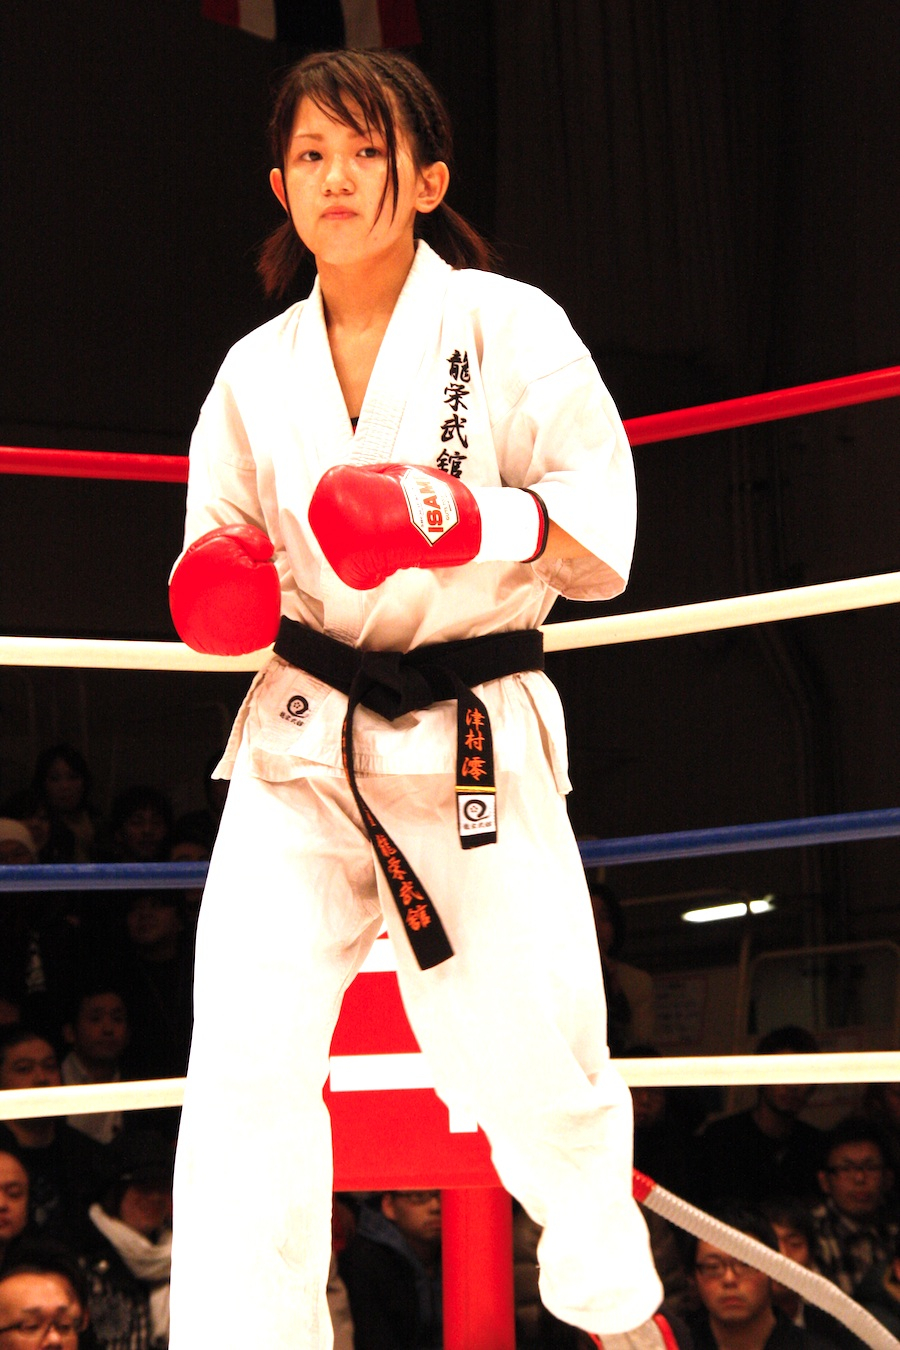 MiOの画像 p1_12